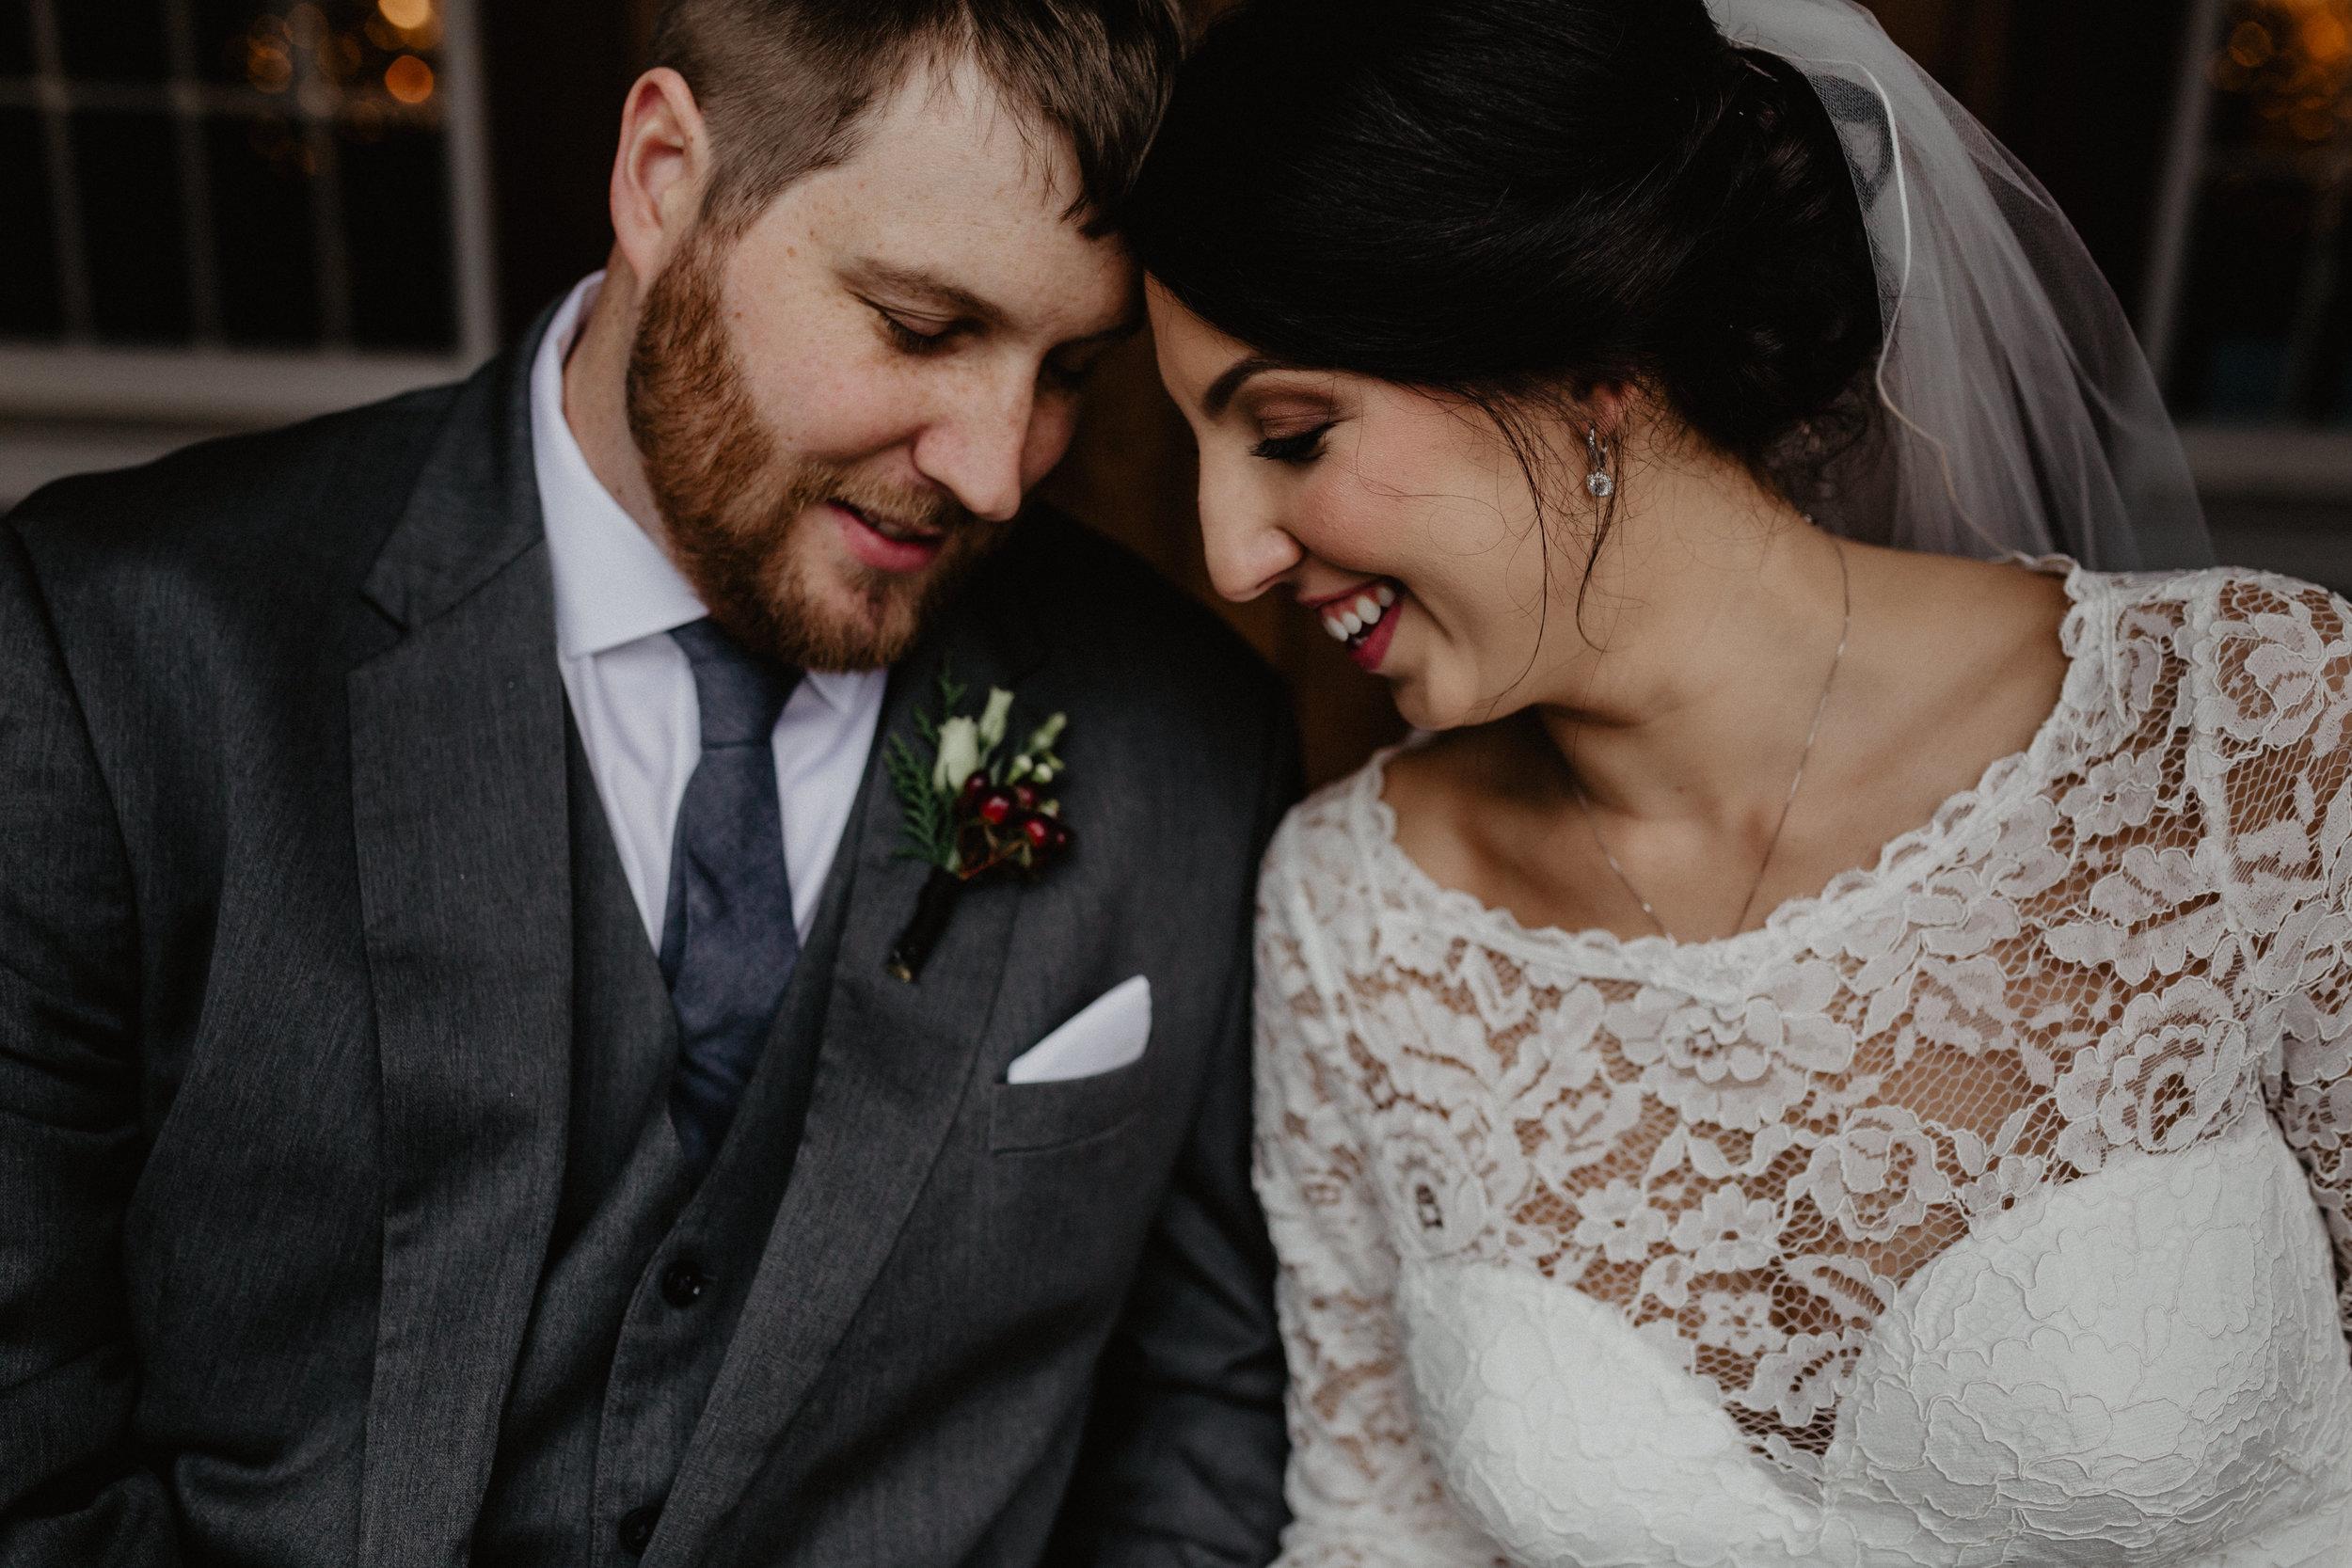 old_daley_on_crooked_lake_wedding_032.jpg